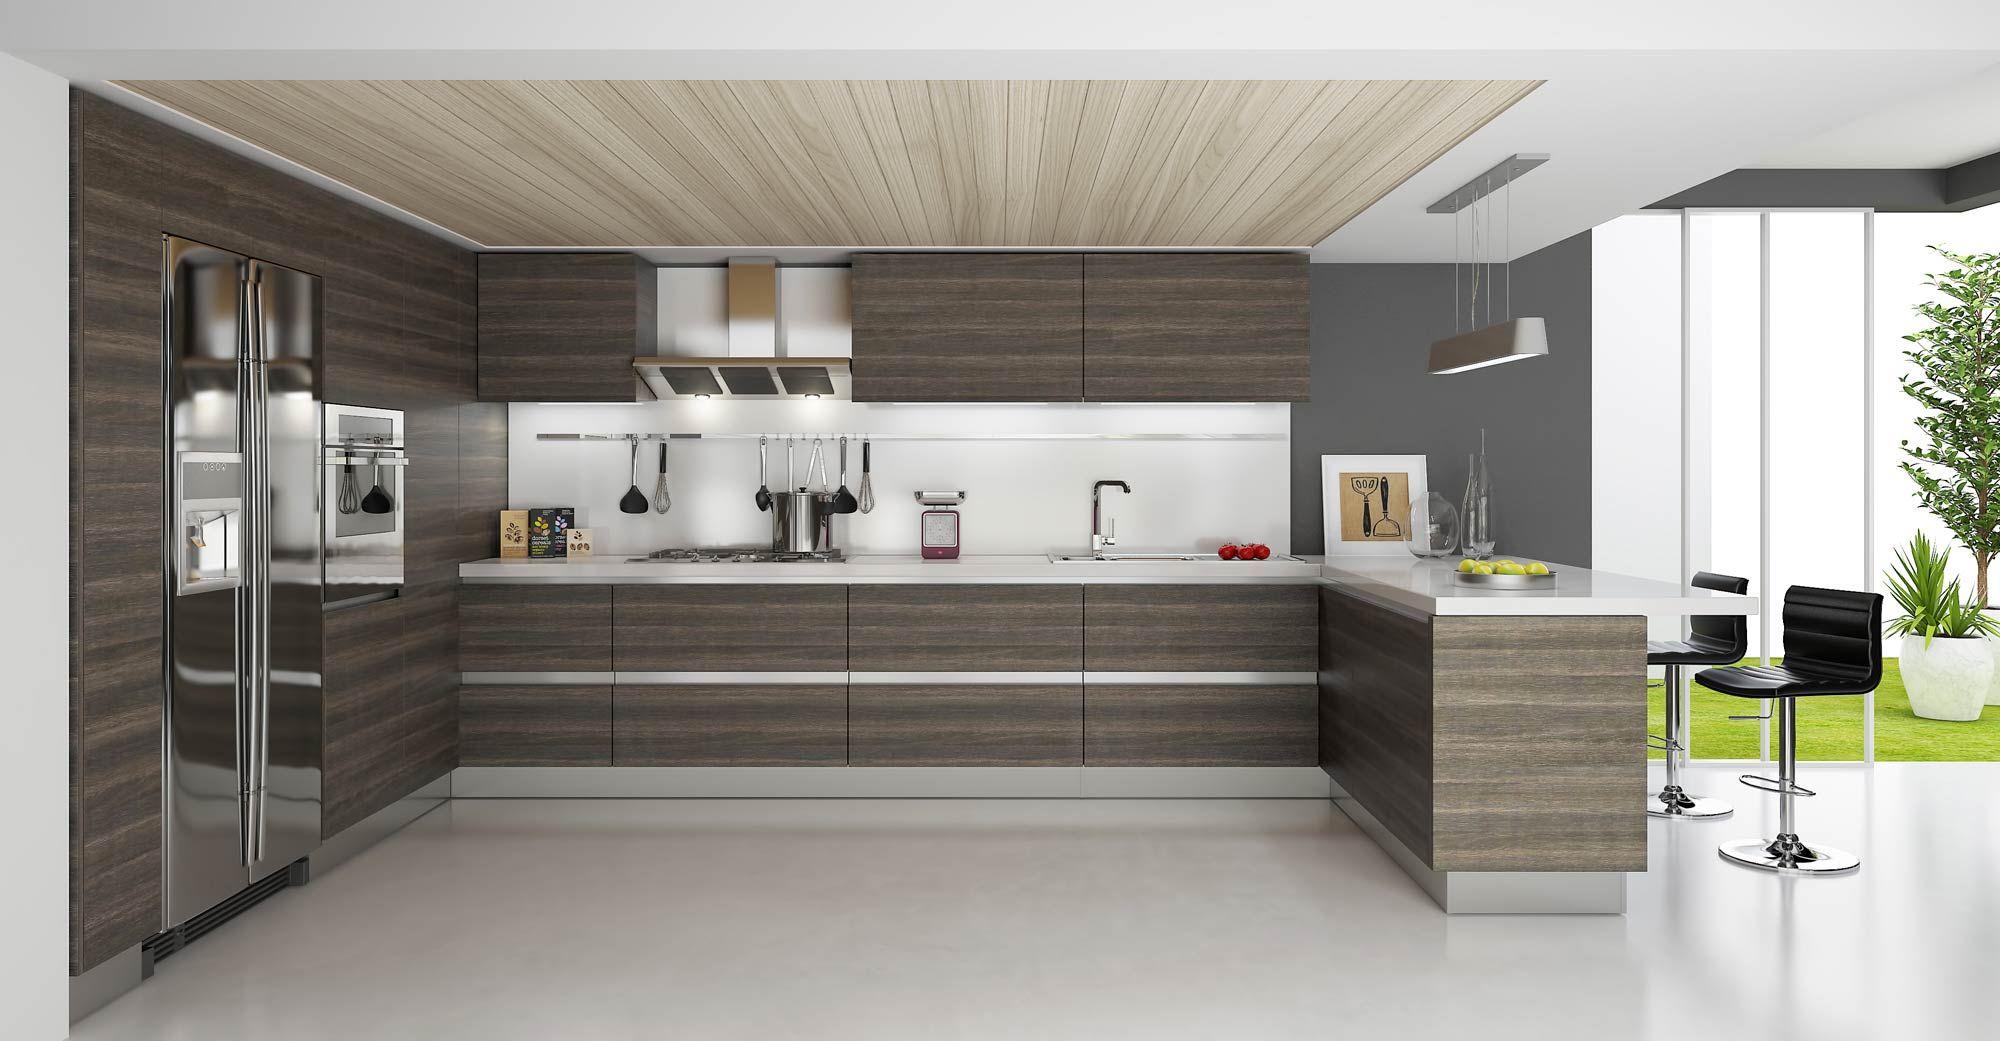 modern wooden kitchens white countertop - Google Search ...